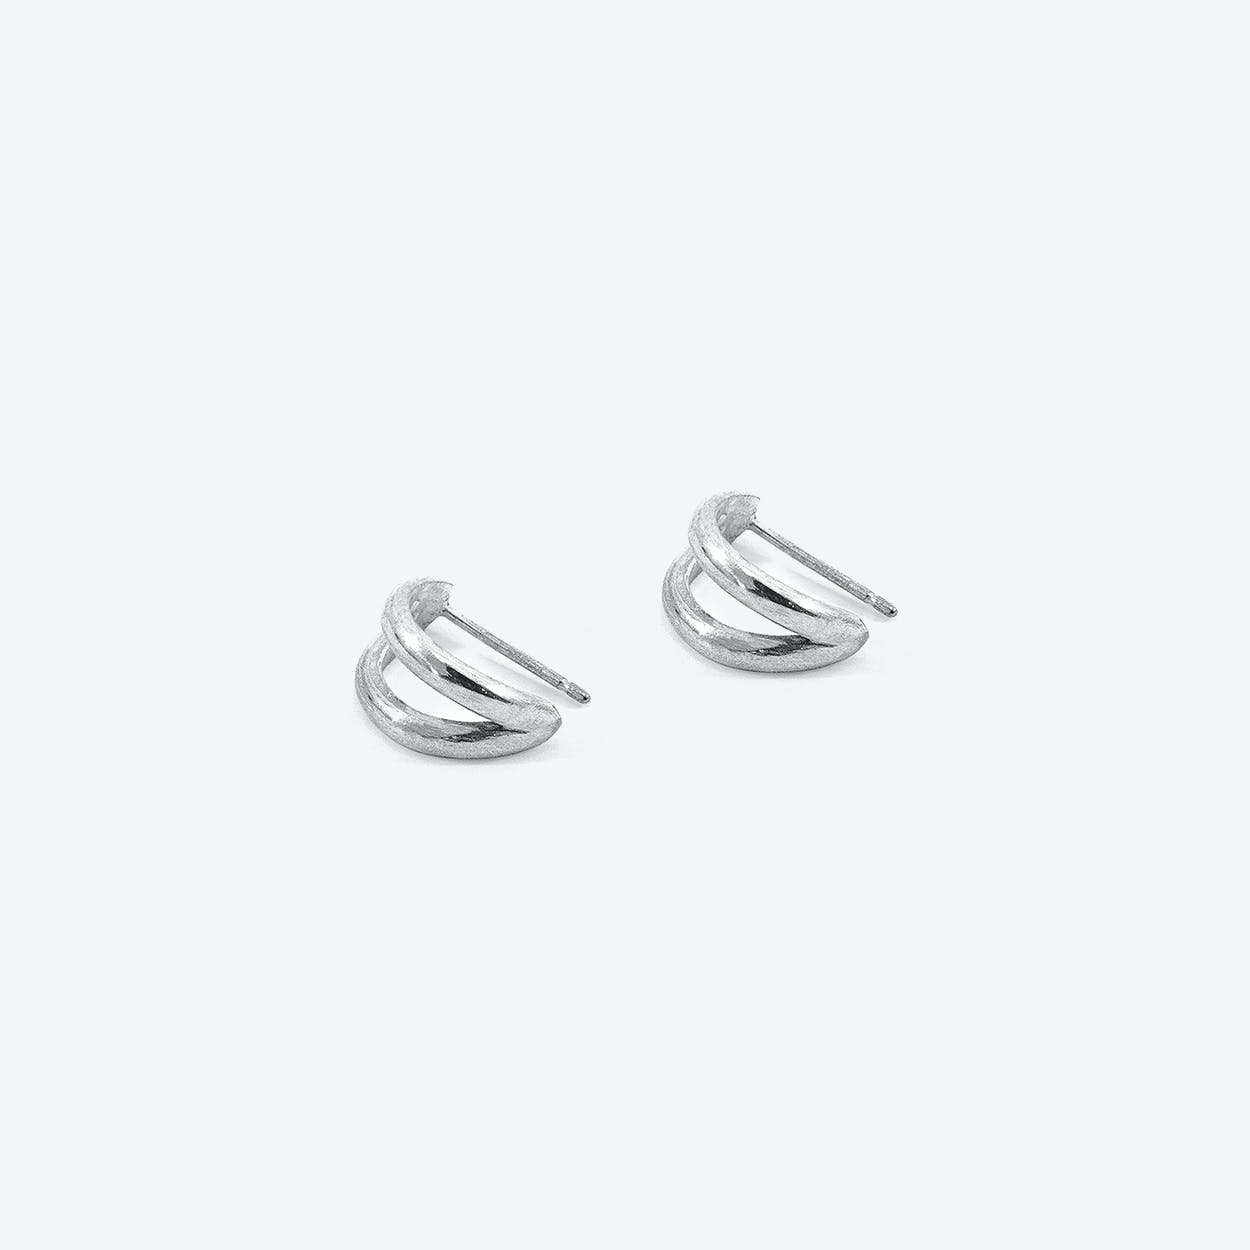 Huntington Surf Silver Earring Studs